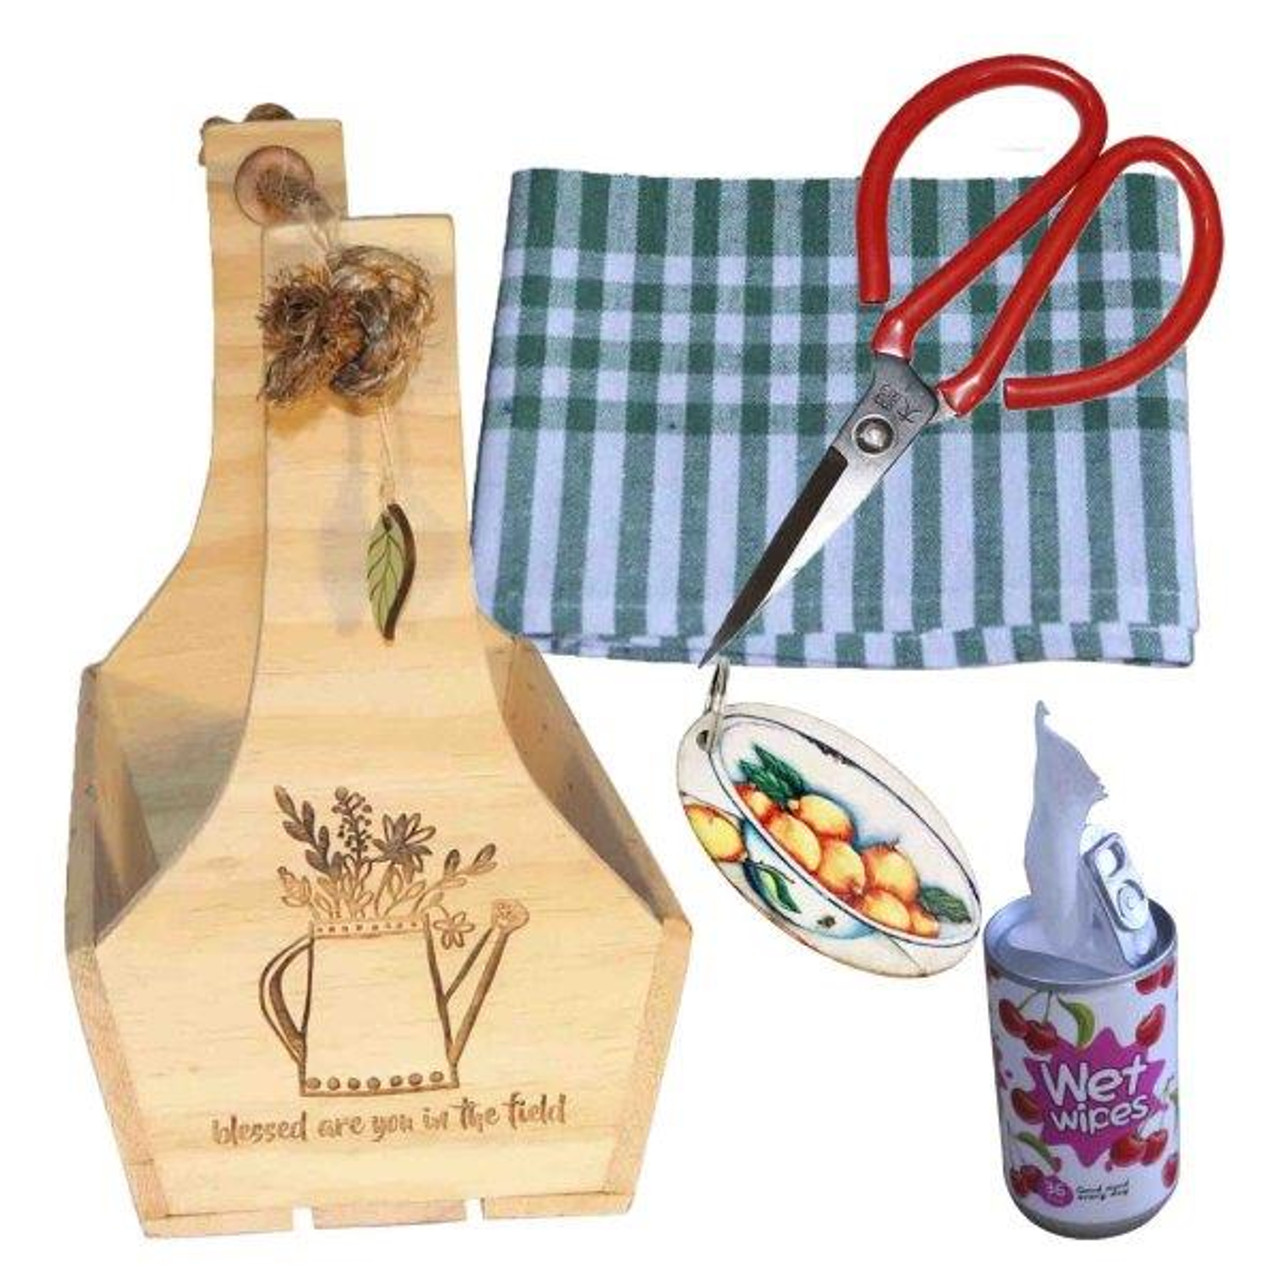 GIFT3 Gift Set For The Garden Lover - Bali Trading Wholesale